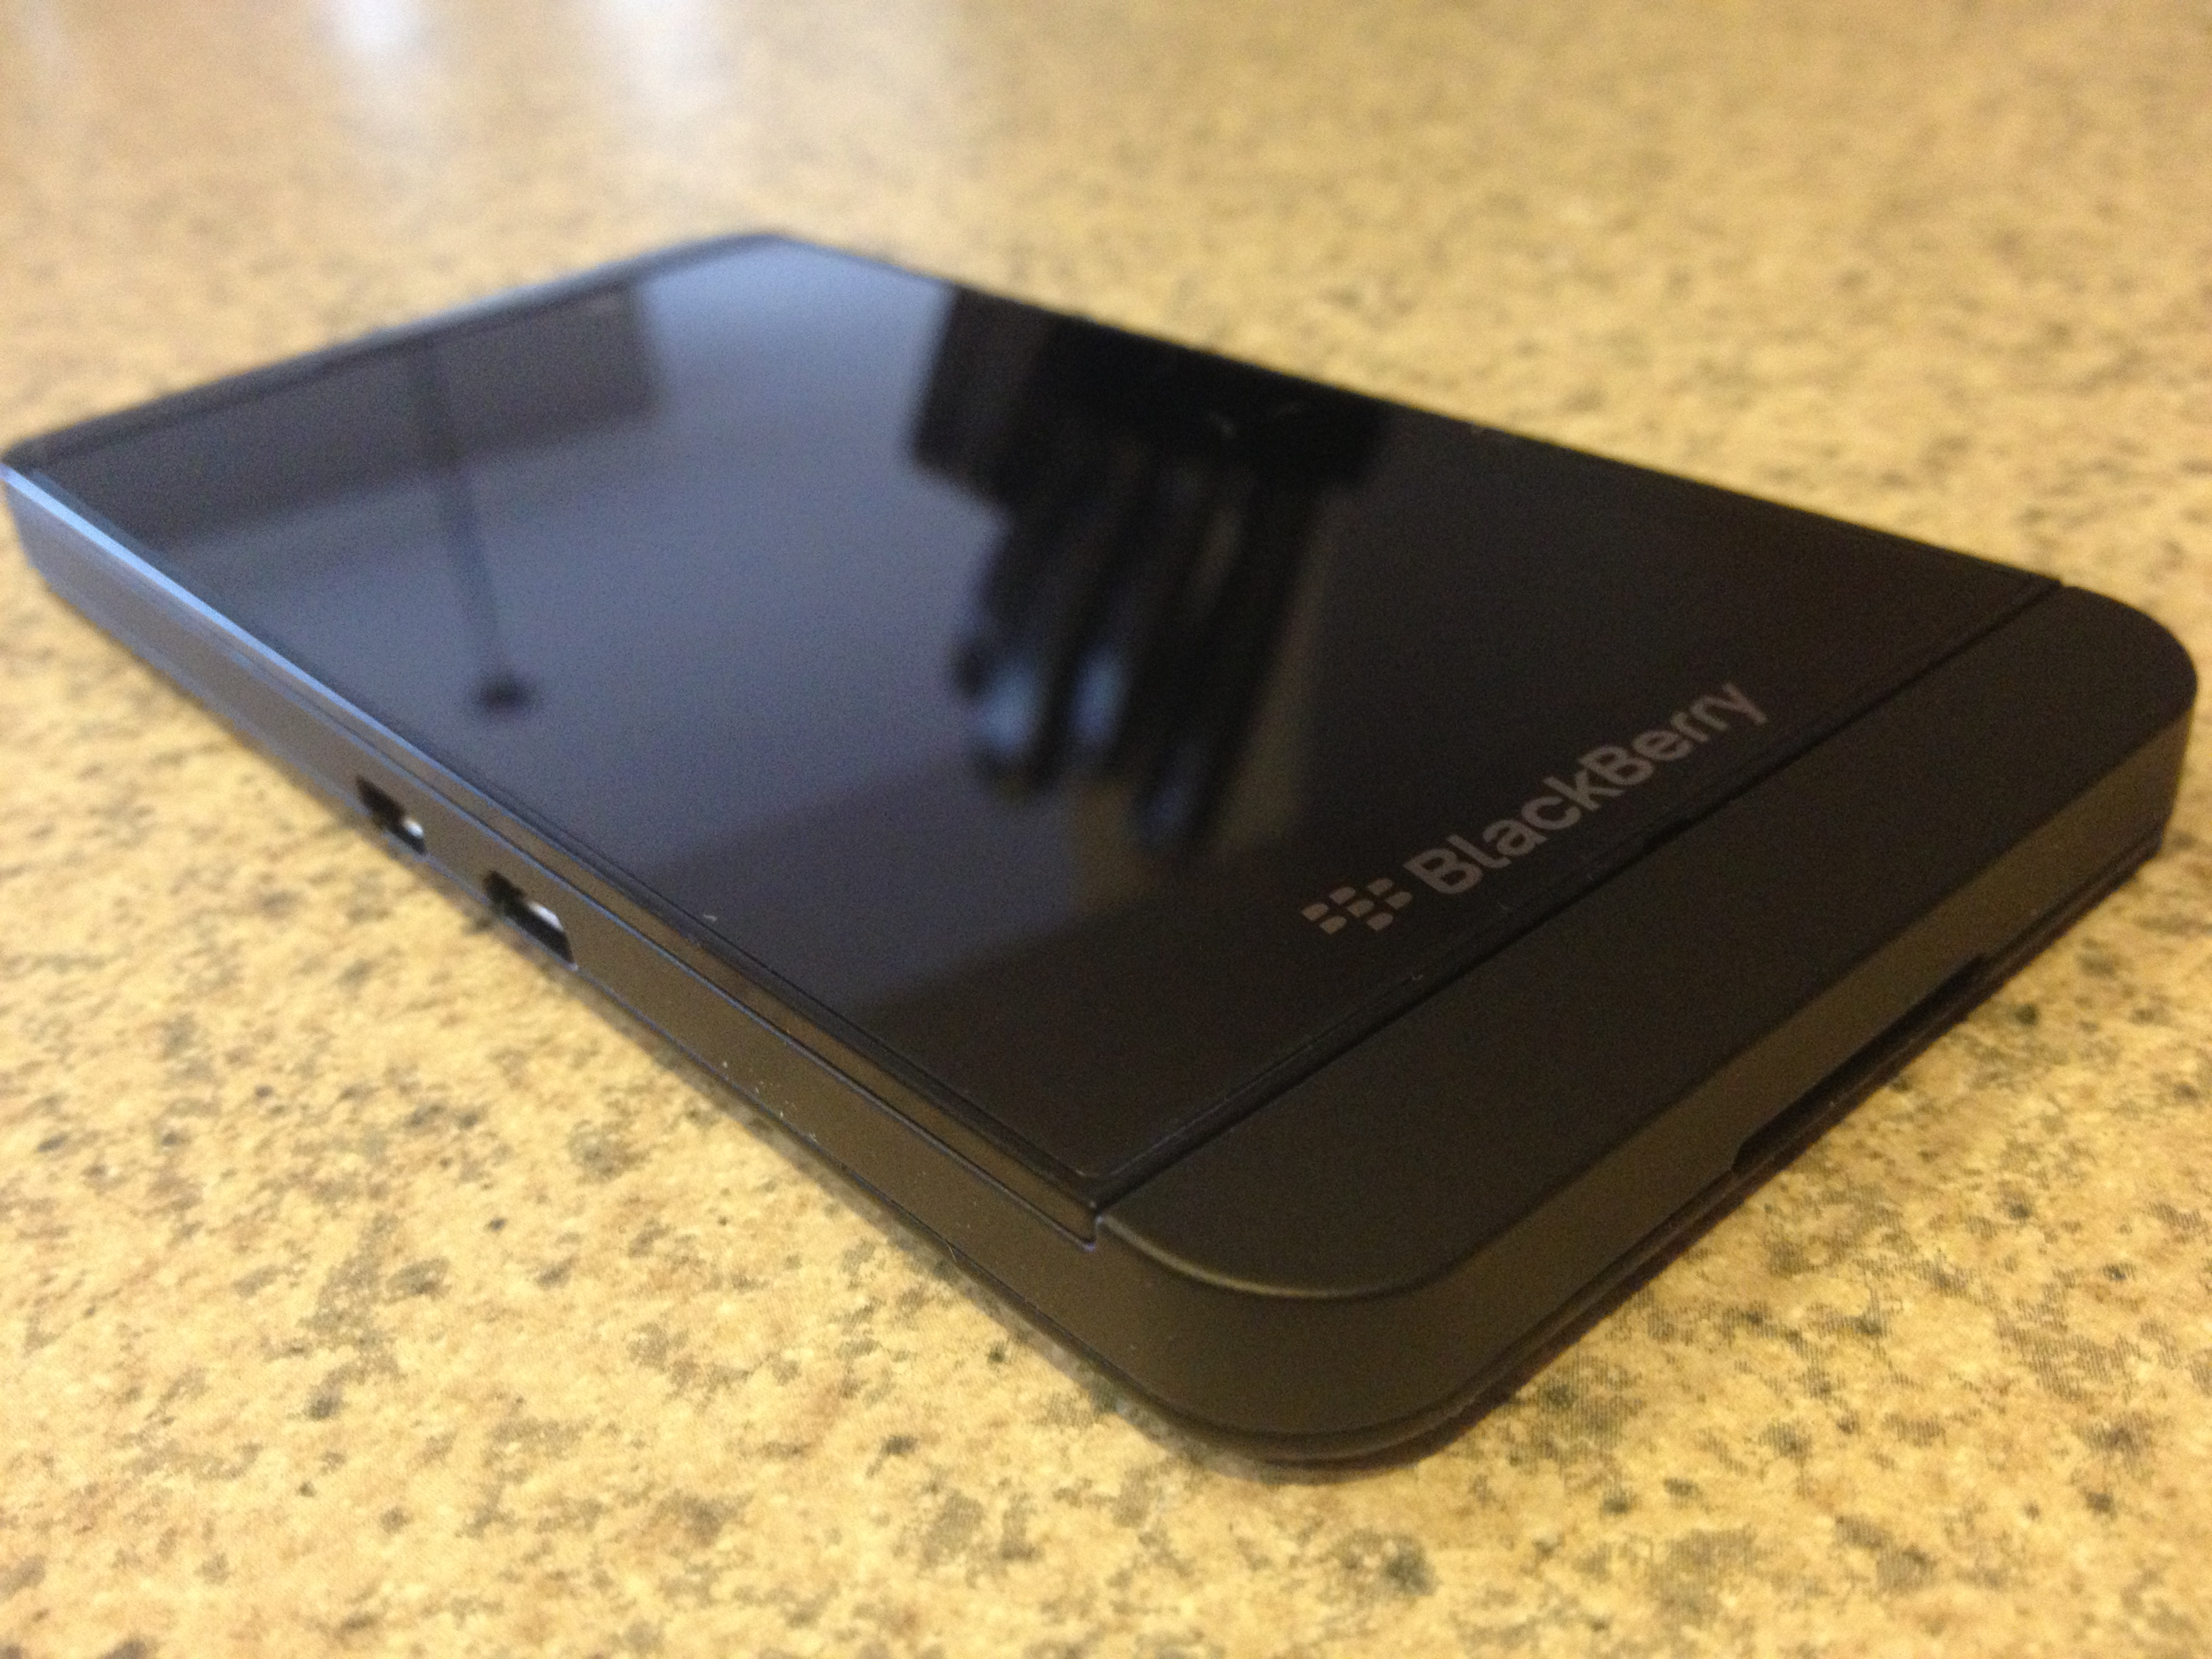 BlackBerry CEO Has 'No Intention' of Exiting Smartphones